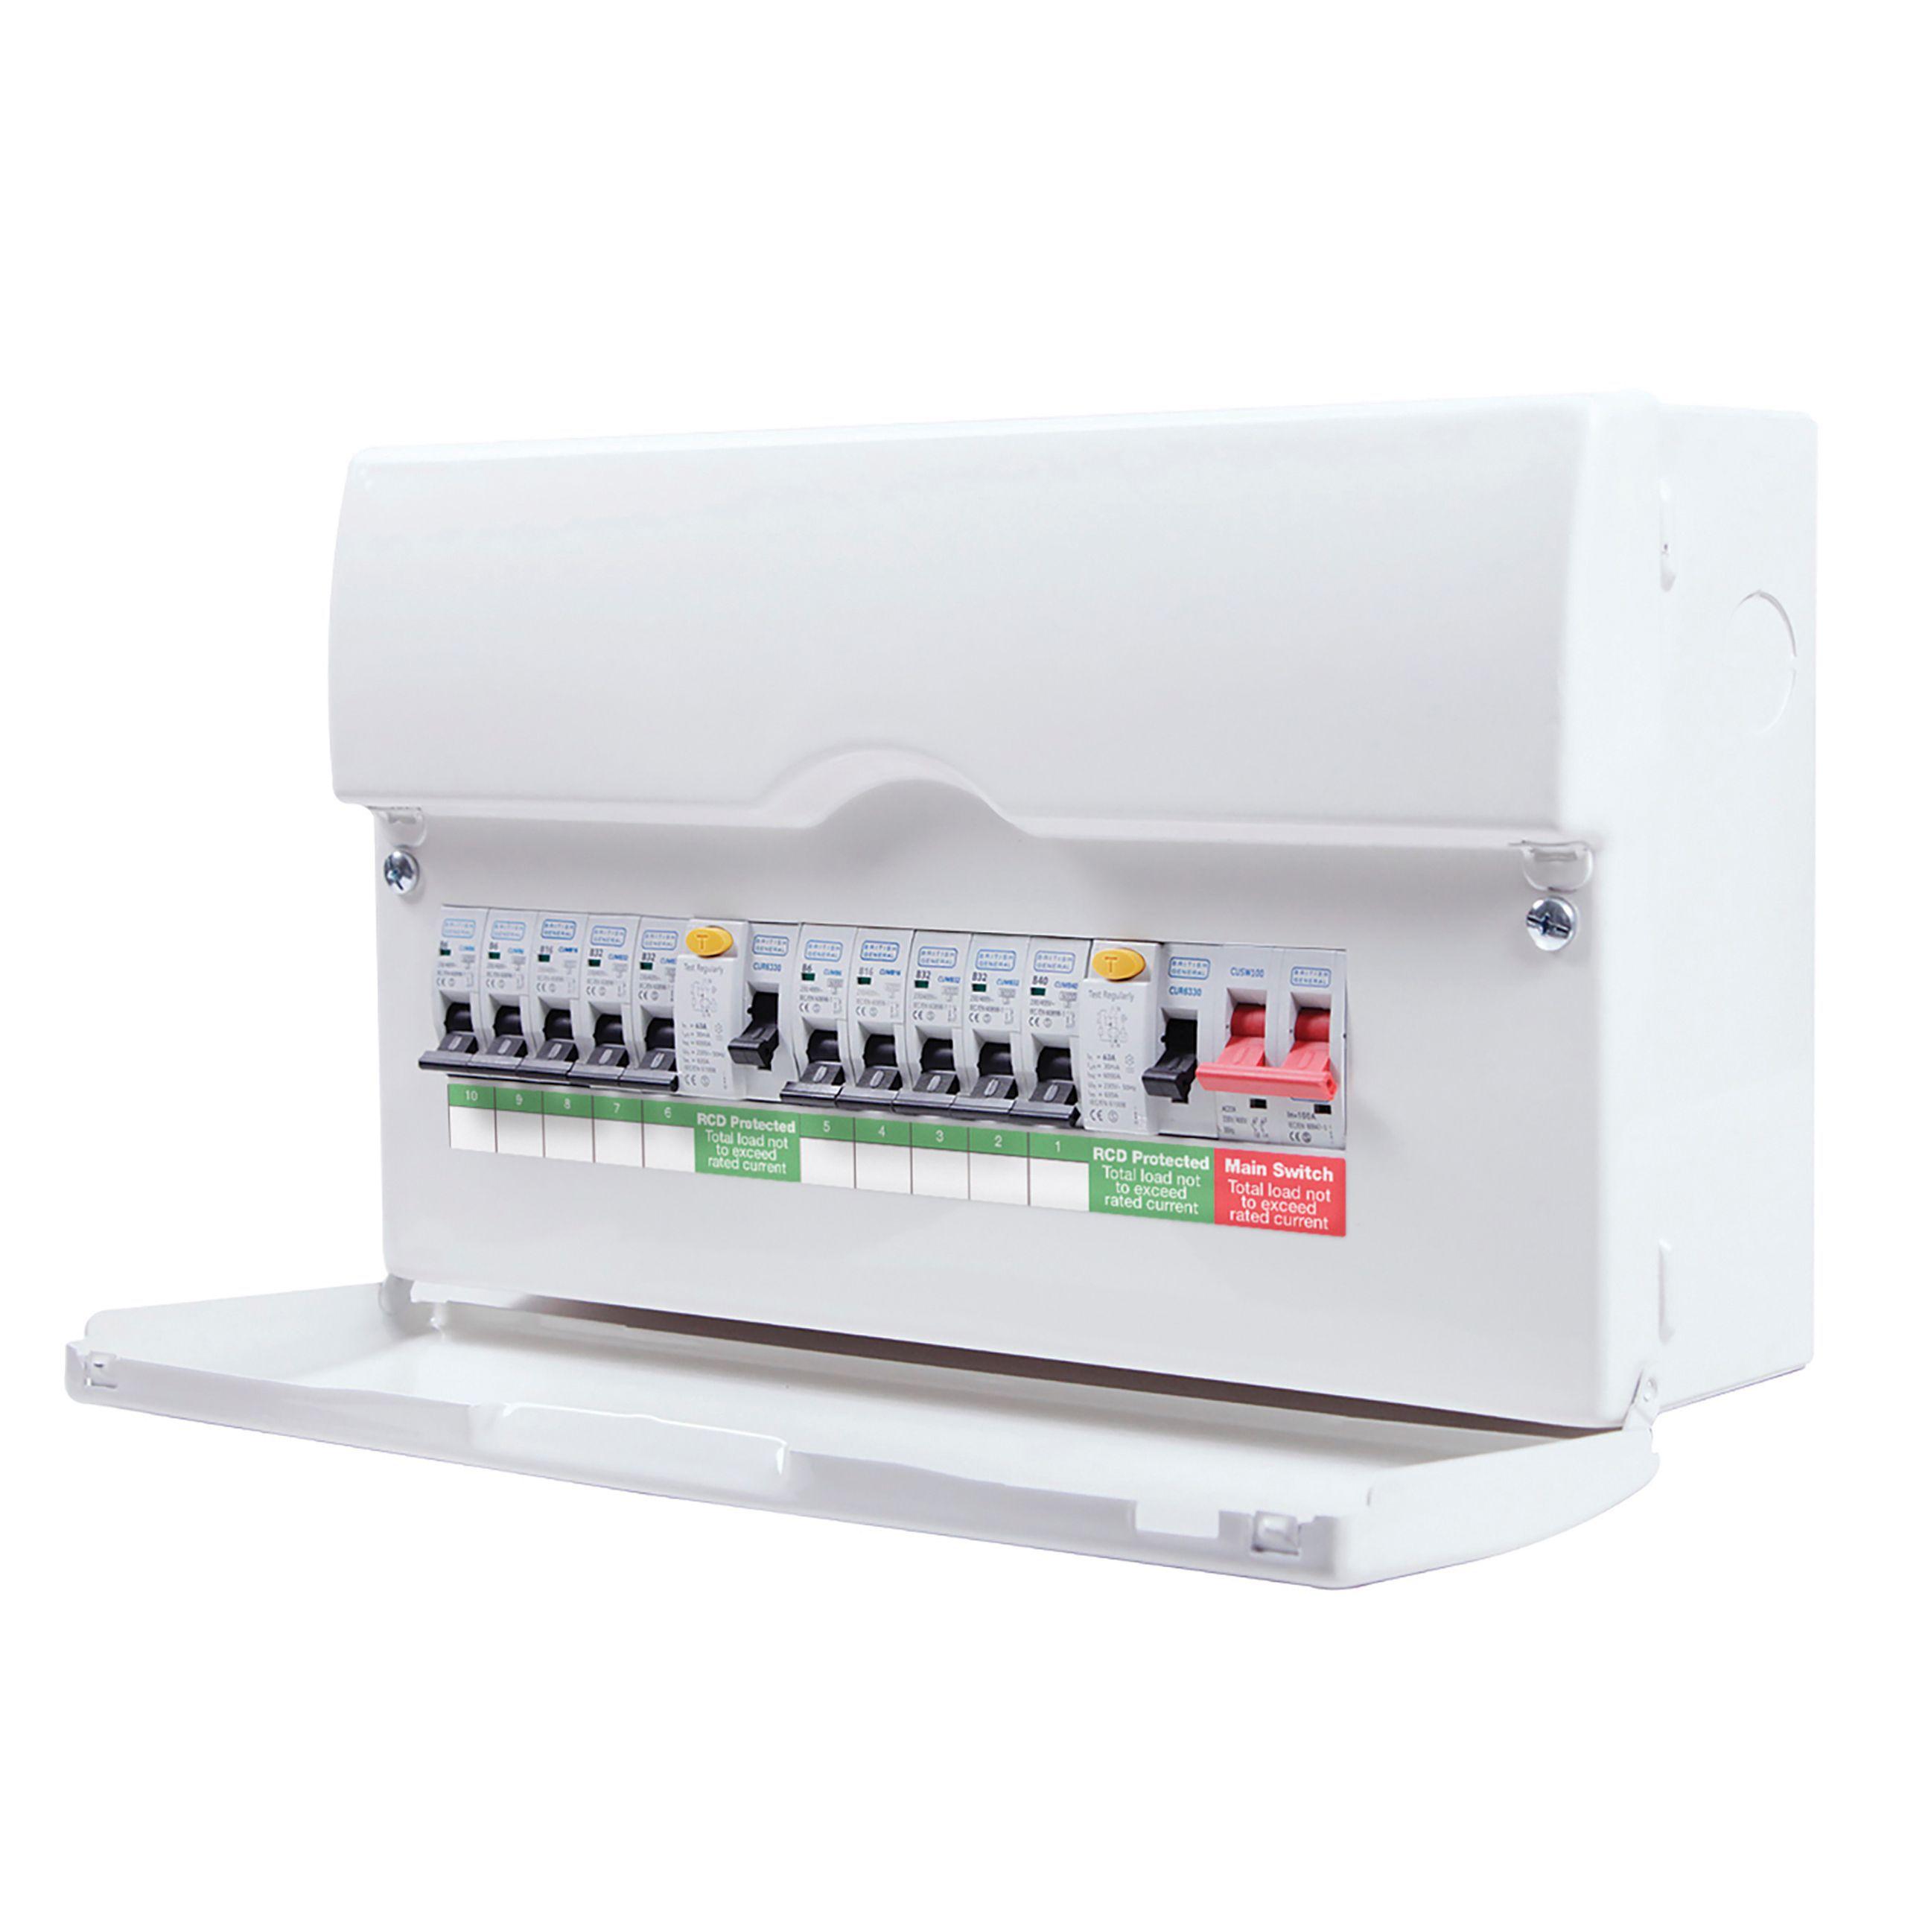 consumer unit wiring diagram split load vdo gauges diagrams oil pressure sender bg 100a 10 way metal enclosure departments